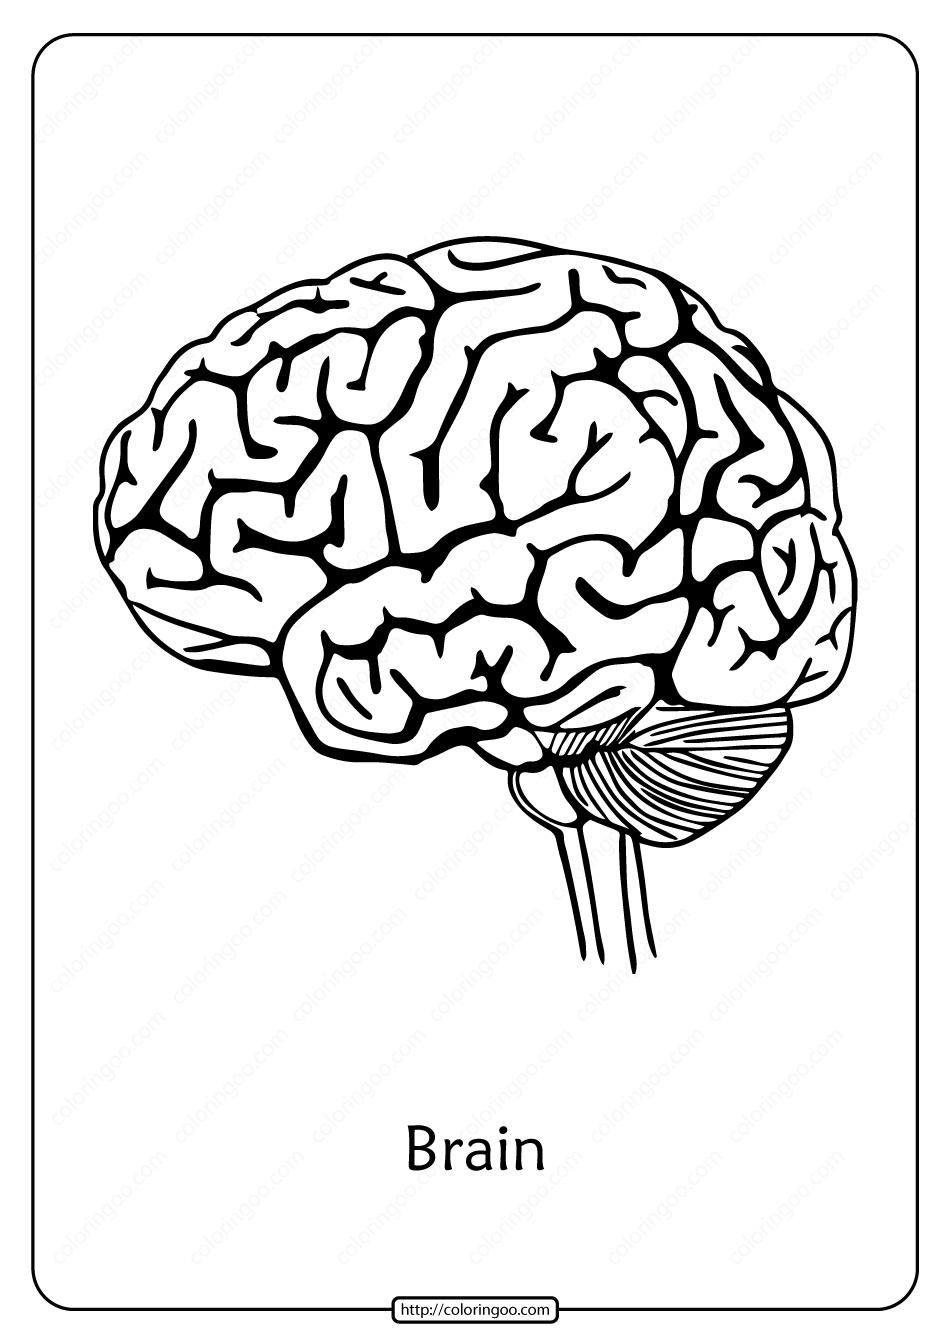 Free Printable Biology Outline Pdf Coloring Page Brain Art Drawing Brain Illustration Brain Drawing [ 1344 x 950 Pixel ]